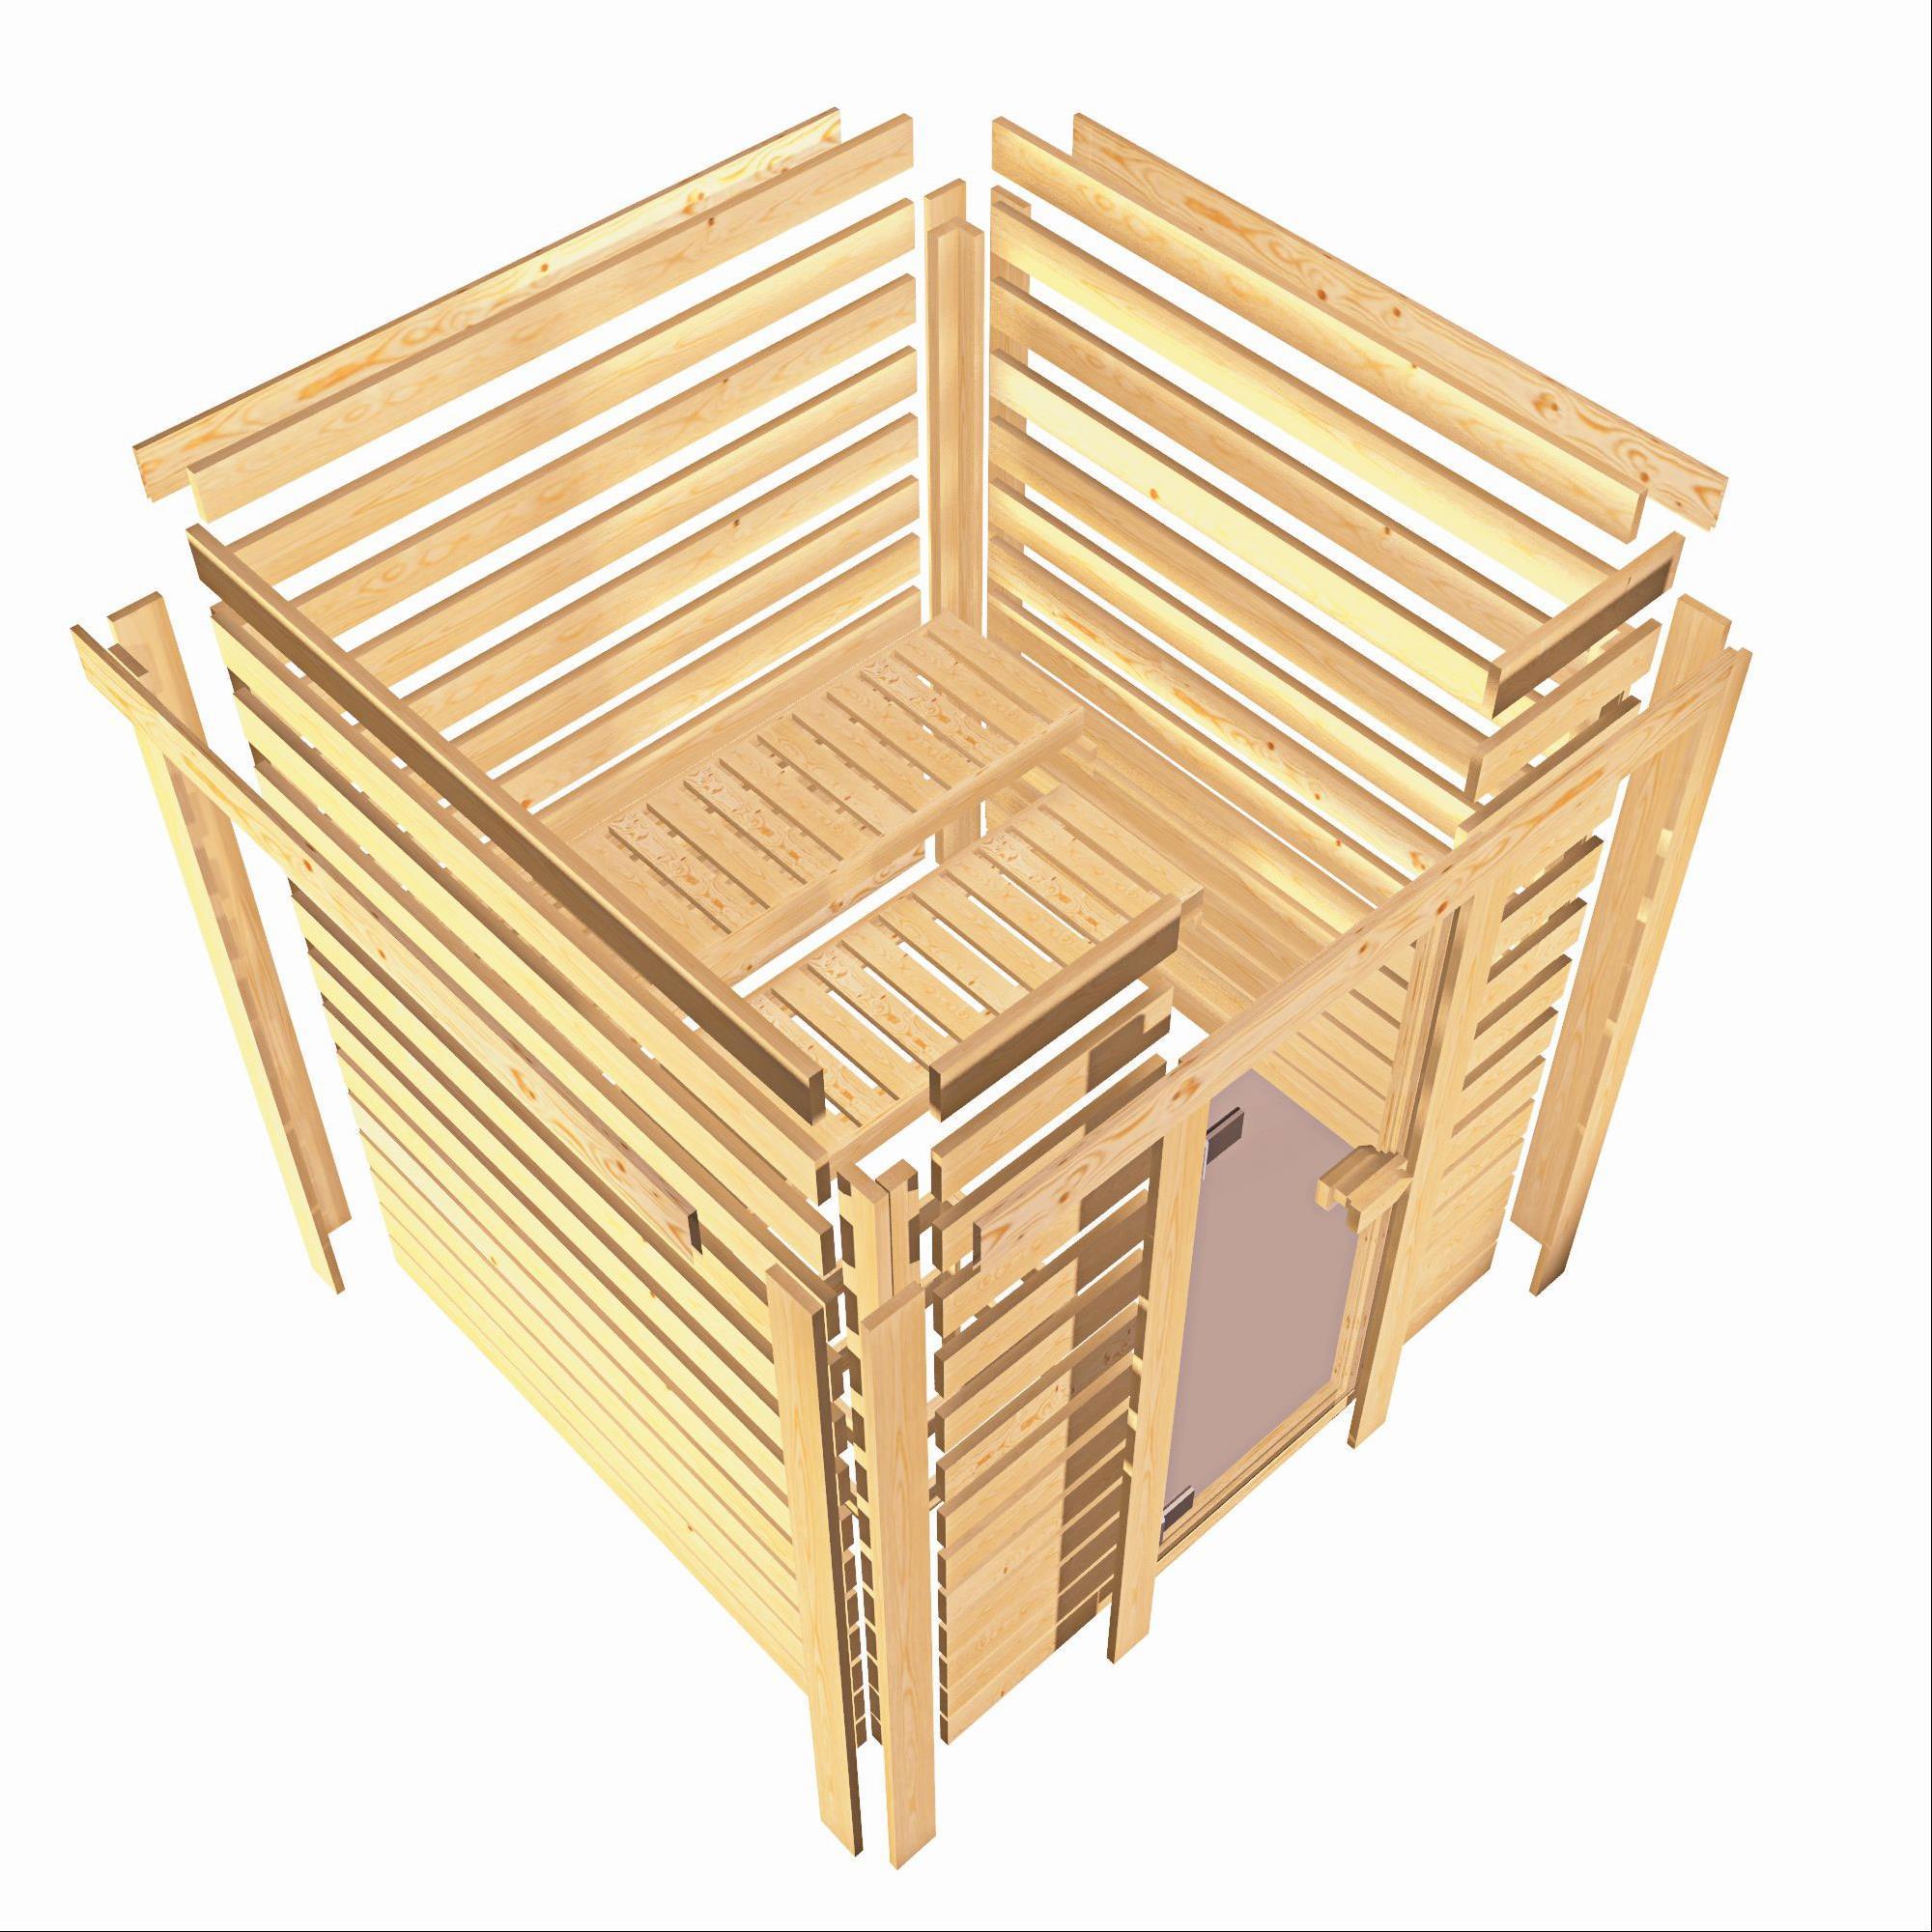 Woodfeeling Sauna Karla 38mm Kranz Ofen 9kW extern Tür Holz Bild 4